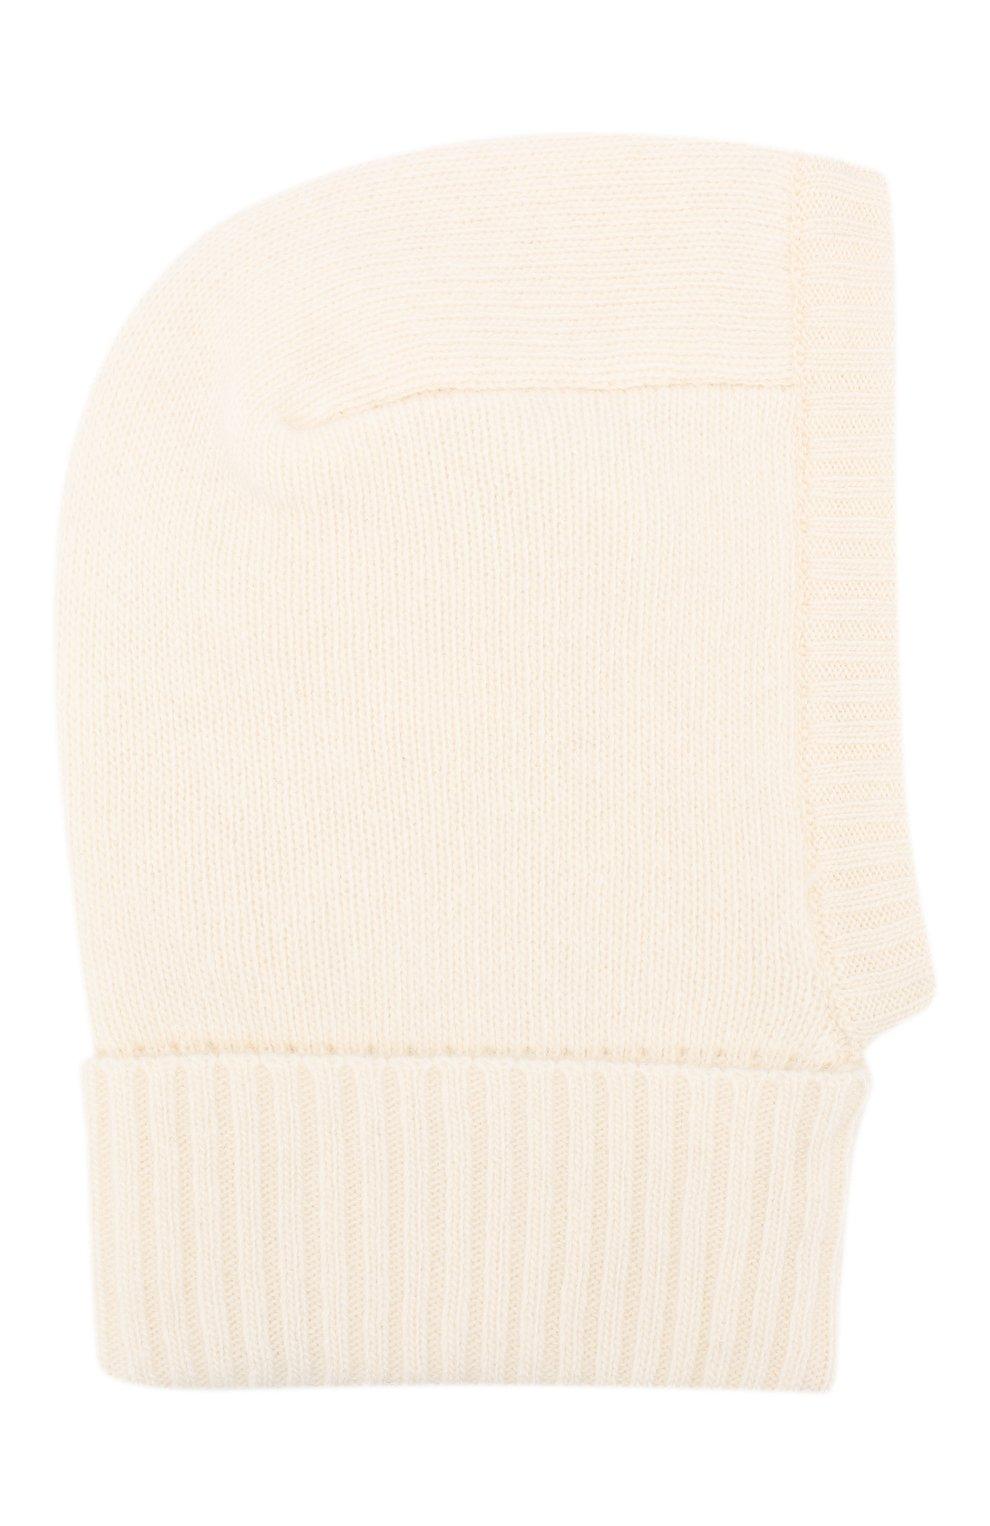 Детского шапка-балаклава из шерсти и кашемира IL TRENINO белого цвета, арт. 18 7529/E2   Фото 1